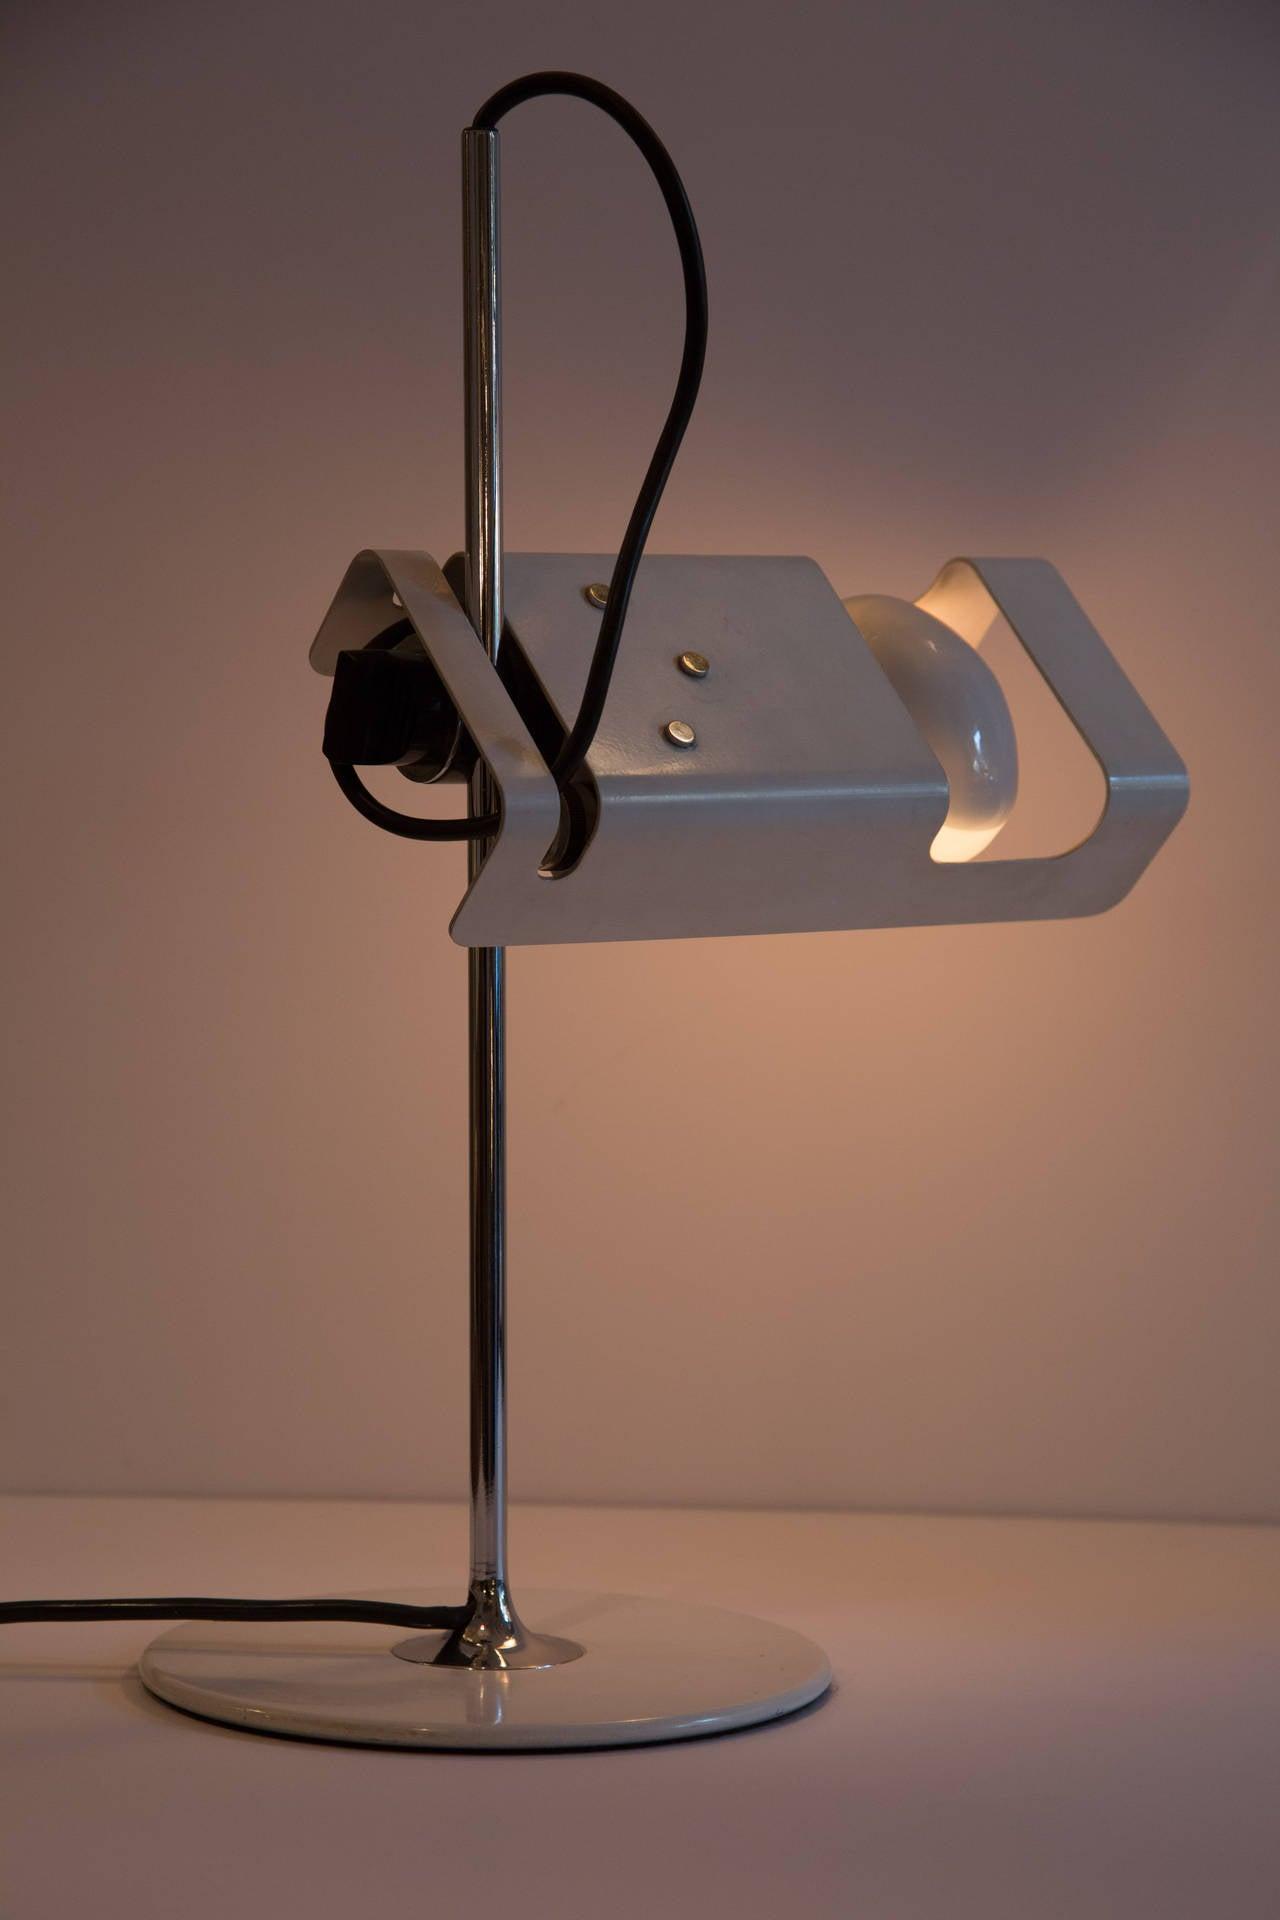 joe colombo spider lamp for o luce for sale at 1stdibs. Black Bedroom Furniture Sets. Home Design Ideas